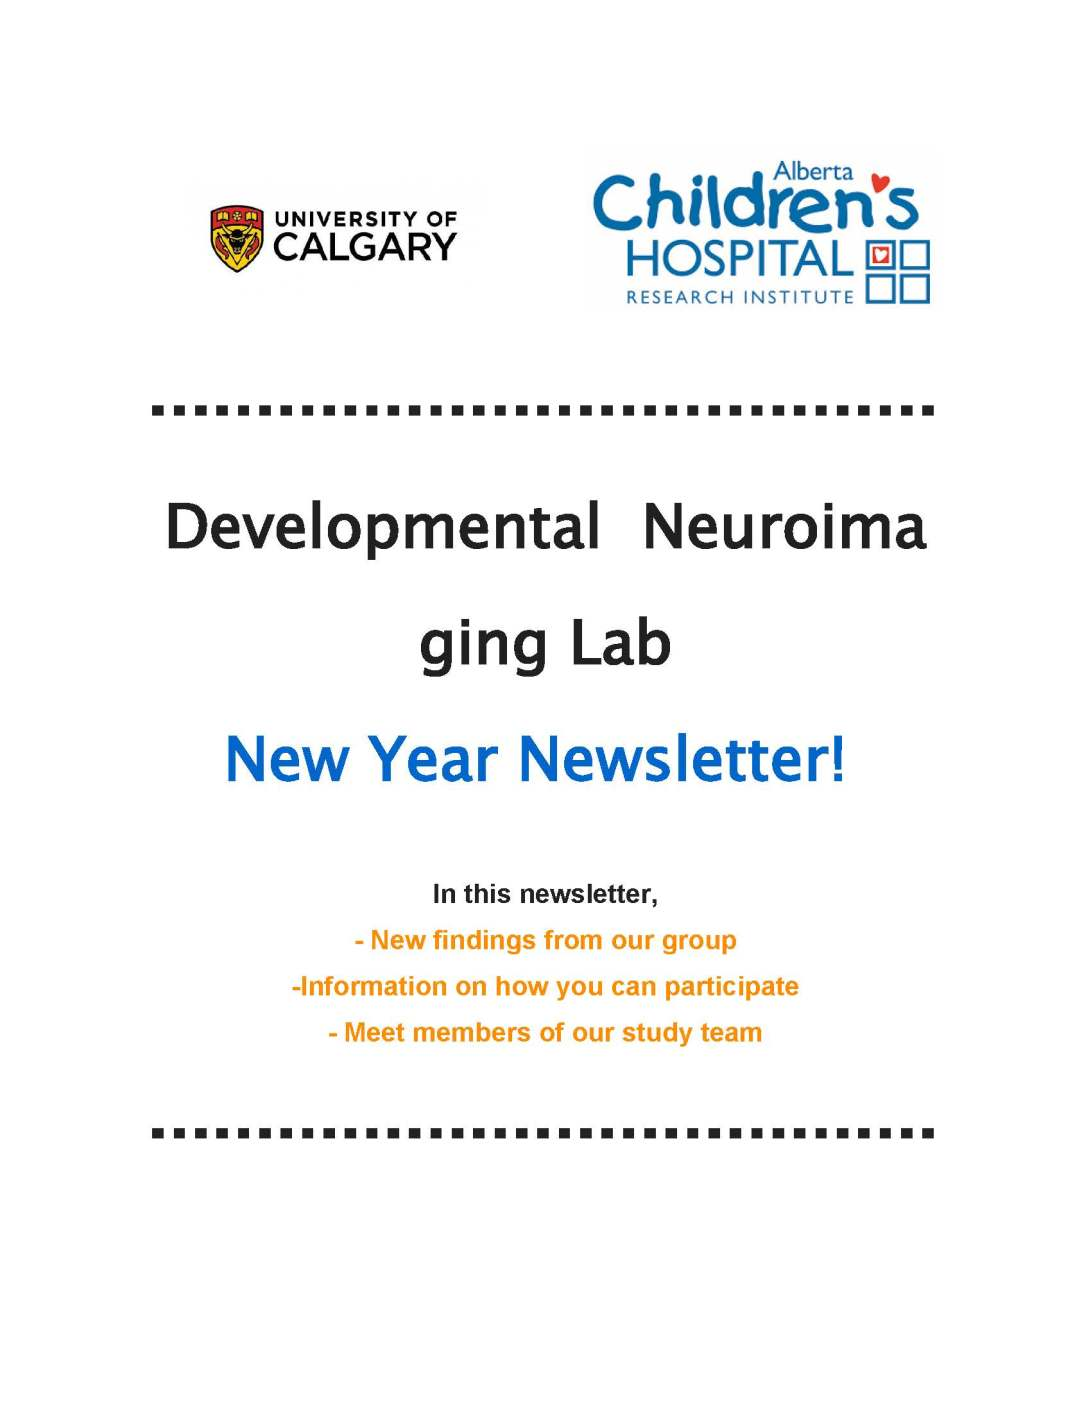 UofC Developmental Neuroimaging Newsletter 1